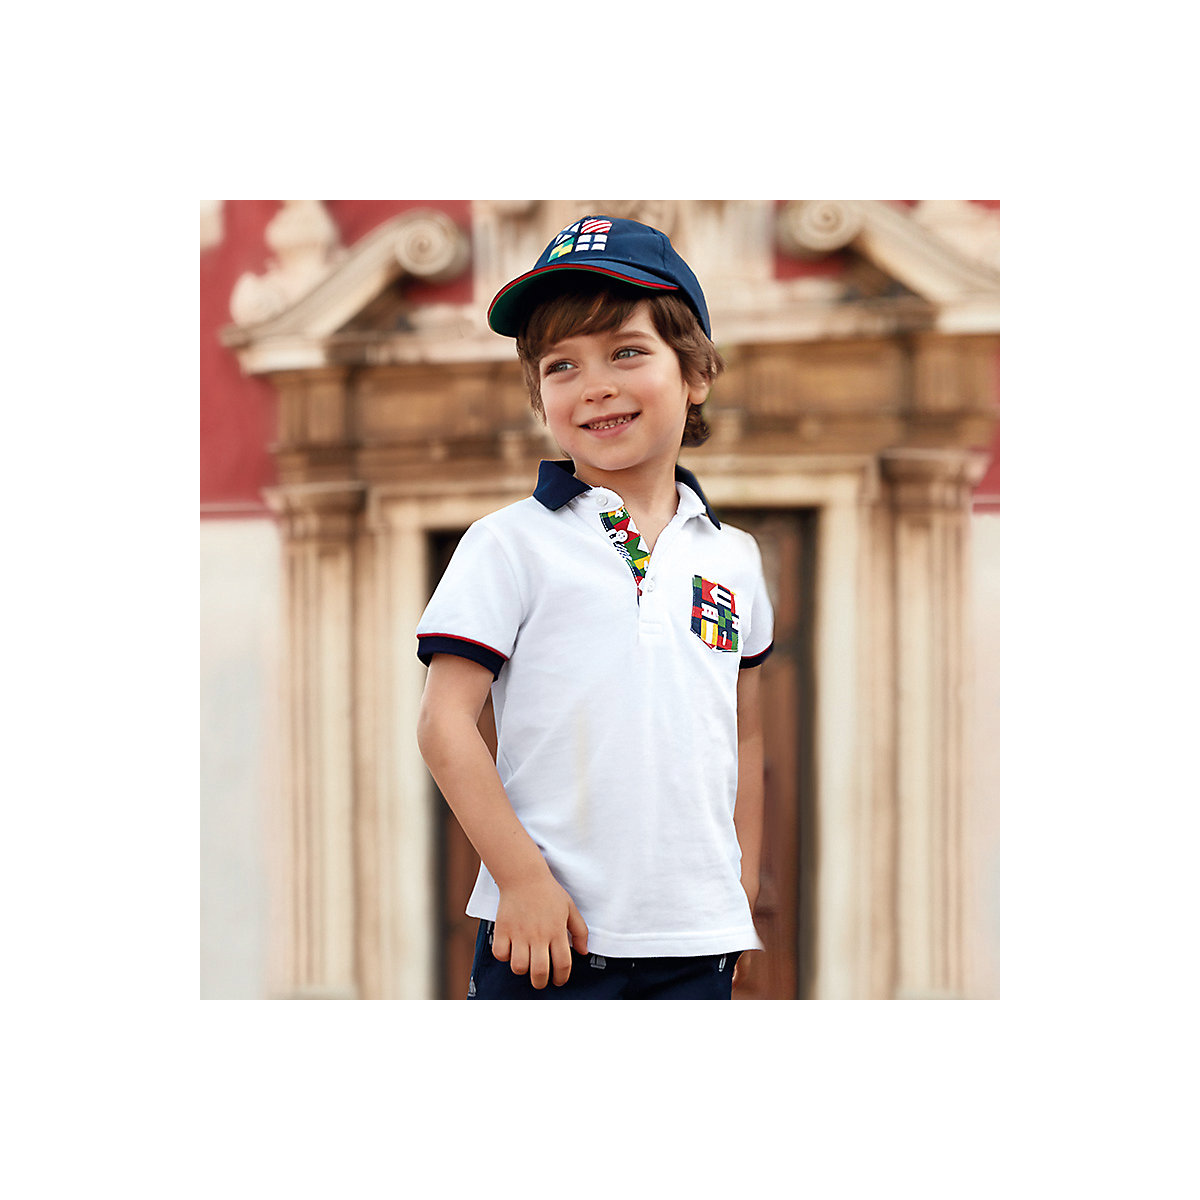 MAYORAL Polo Shirts 10691273 children clothing t-shirt shirt the print for boys